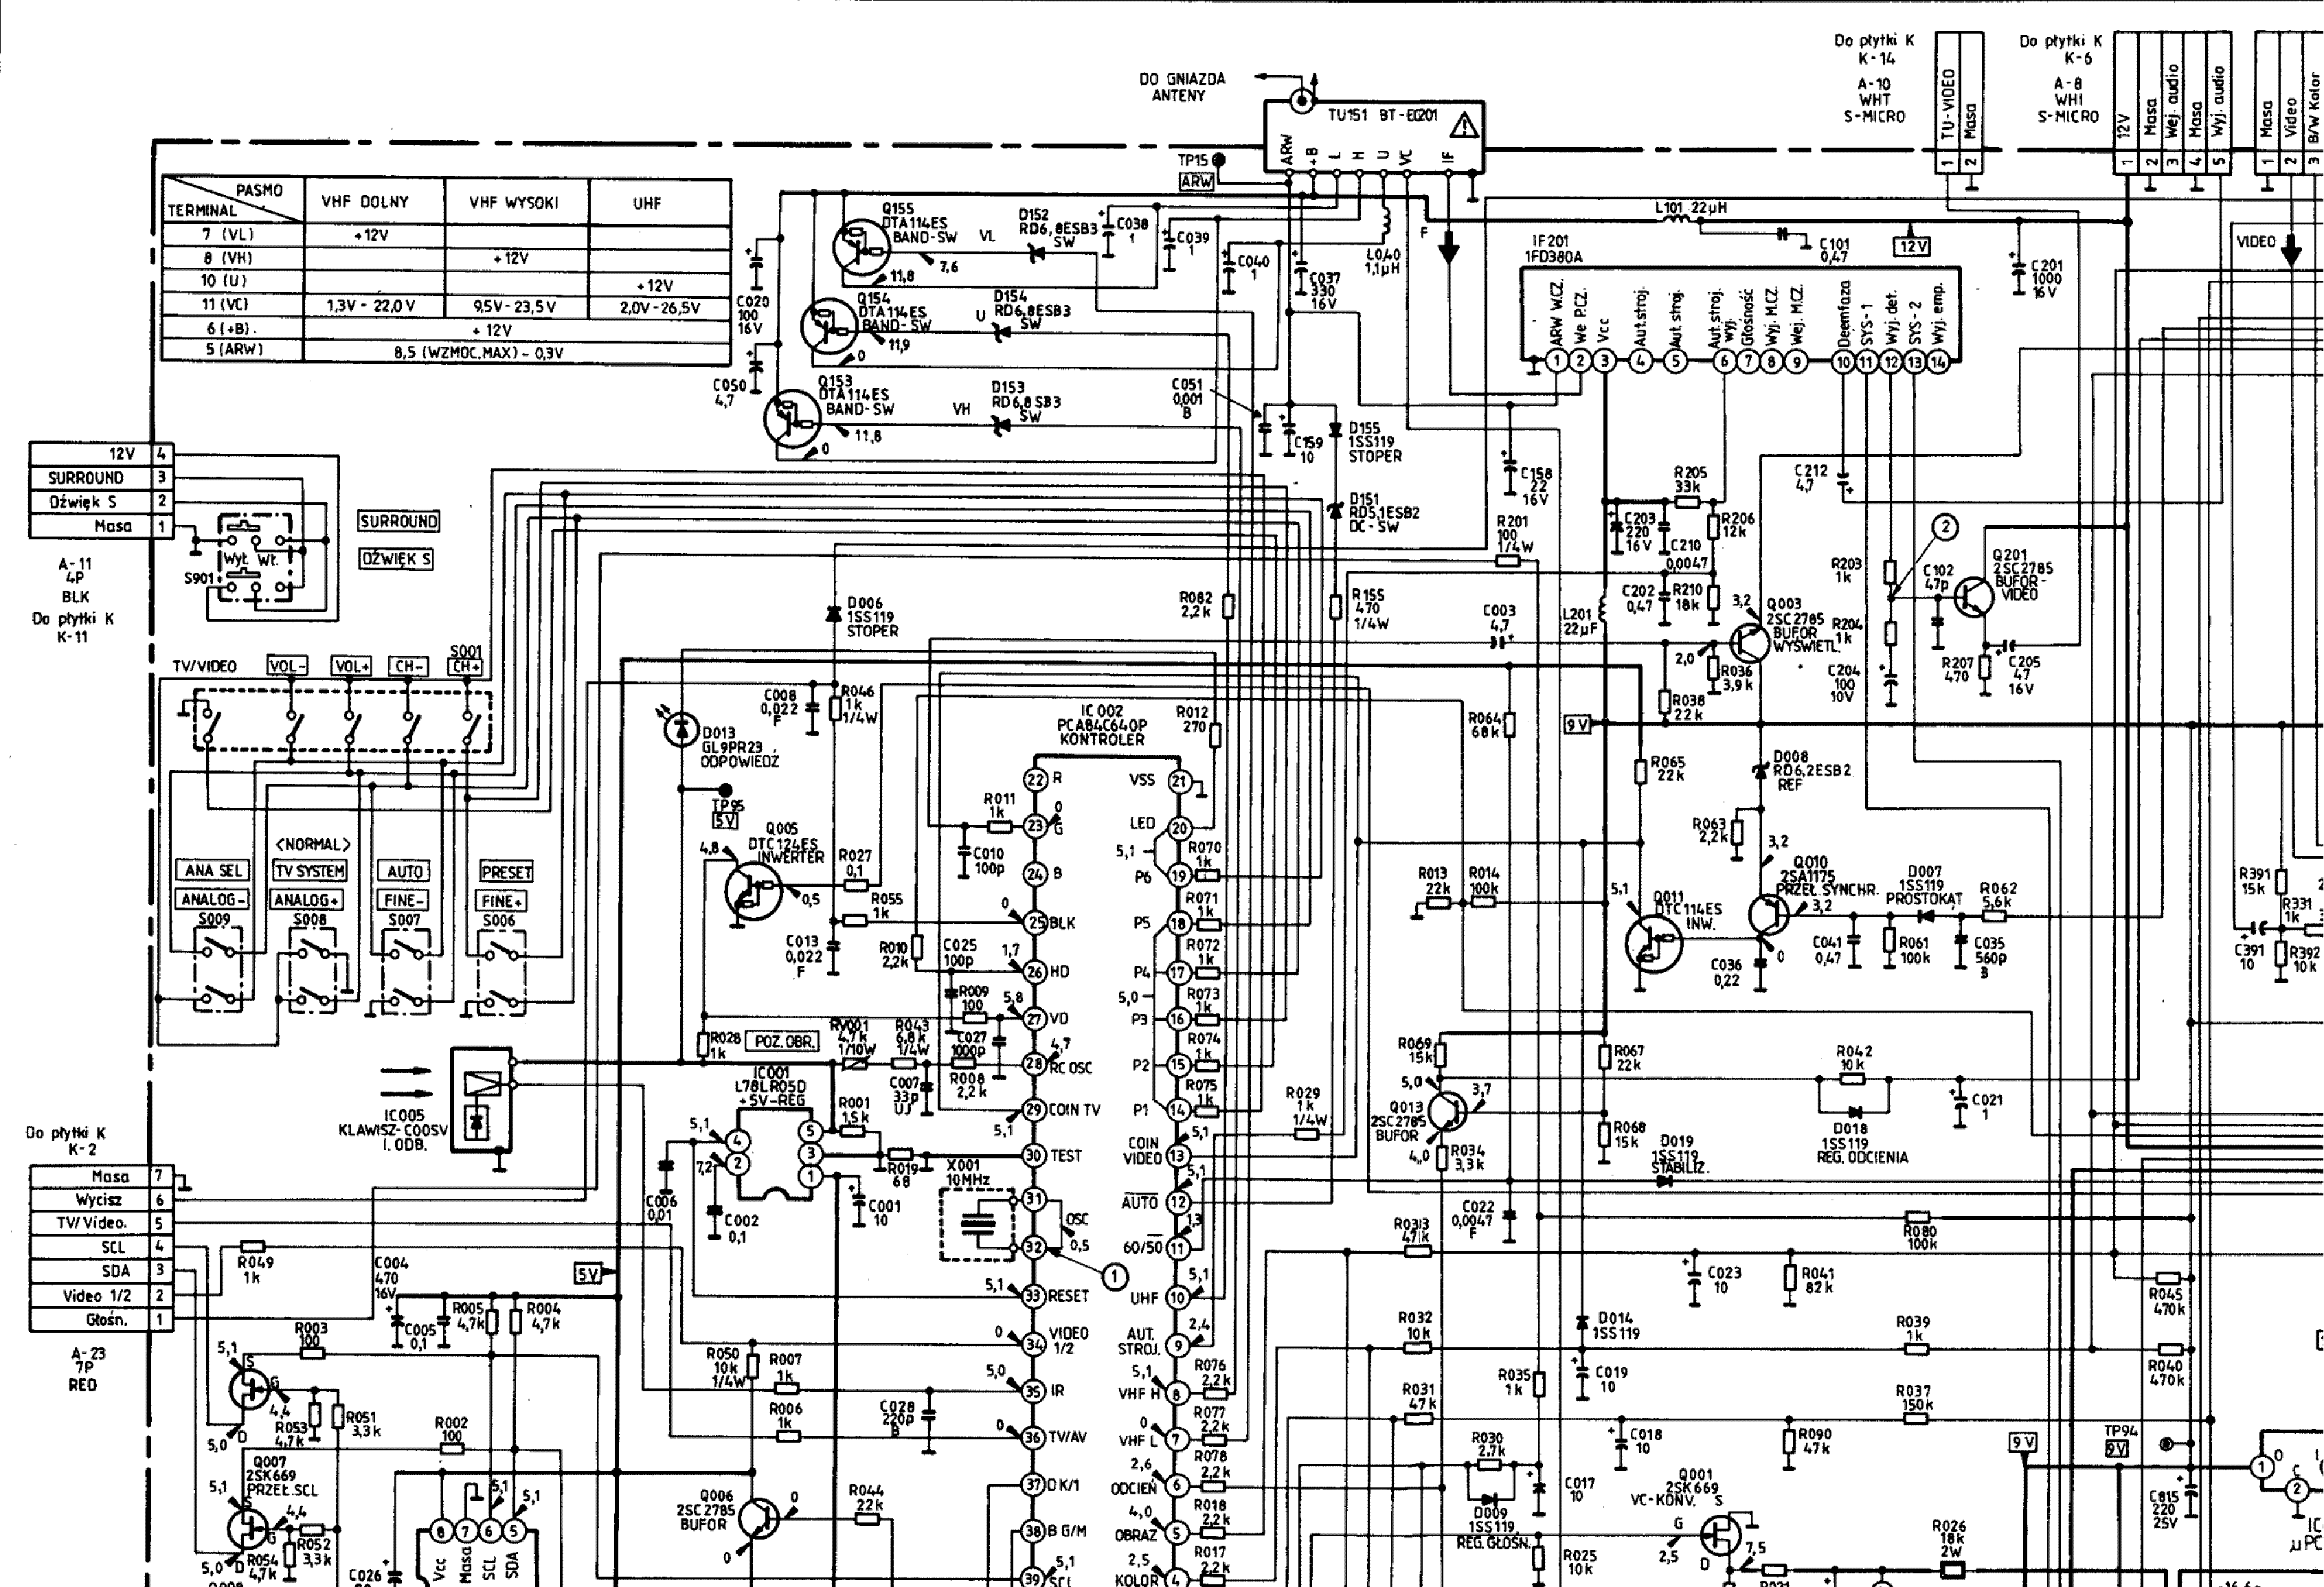 medium resolution of t v circuit diagram free download wiring diagram pagesansui tv circuit diagram free download circuit diagram images